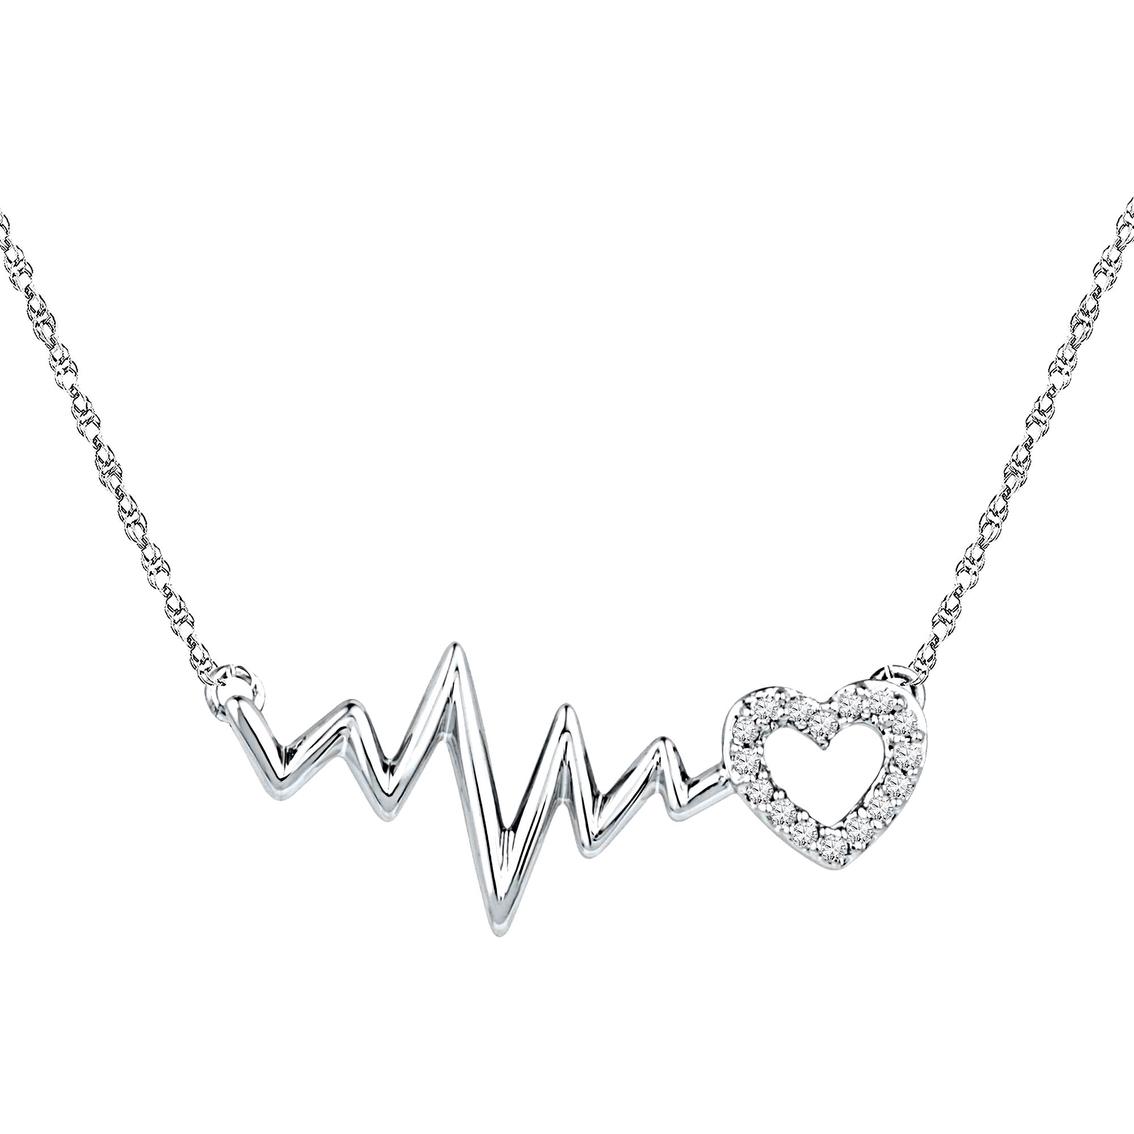 1134x1134 Sterling Silver Diamond Accent Heartbeat Necklace Diamond Heart